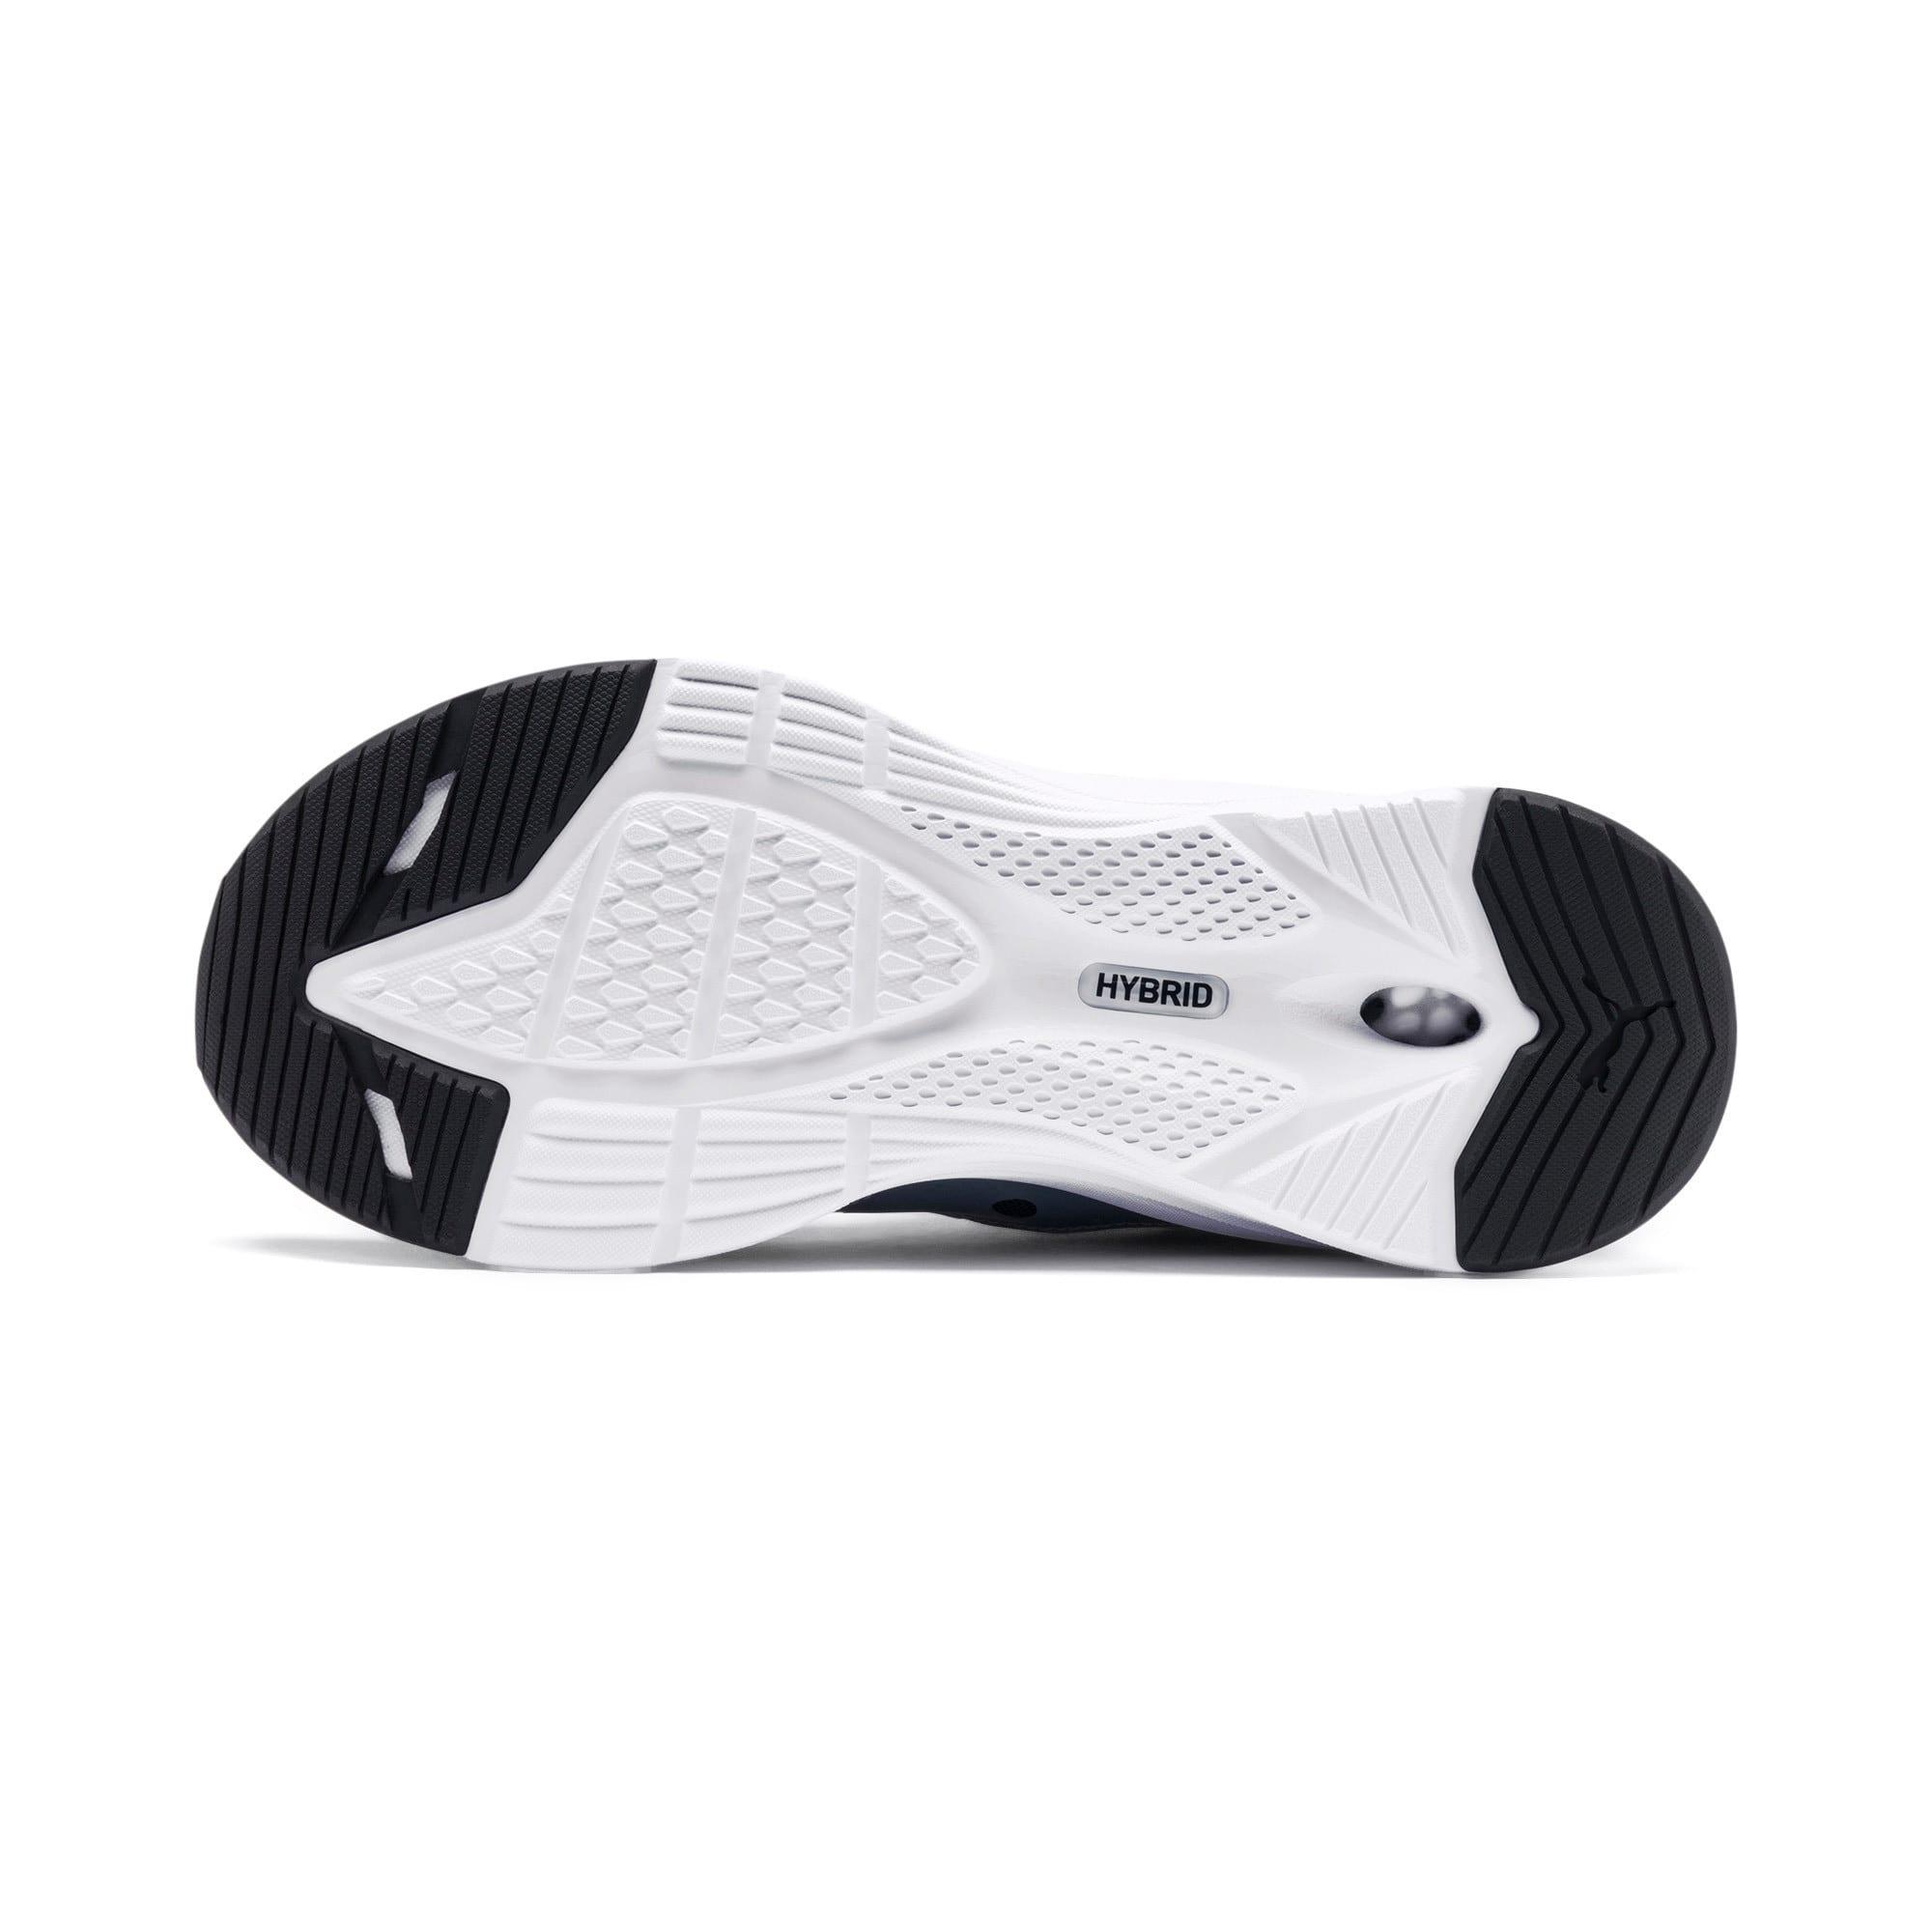 Thumbnail 4 of HYBRID Fuego Running Shoes JR, Puma Black-Puma White, medium